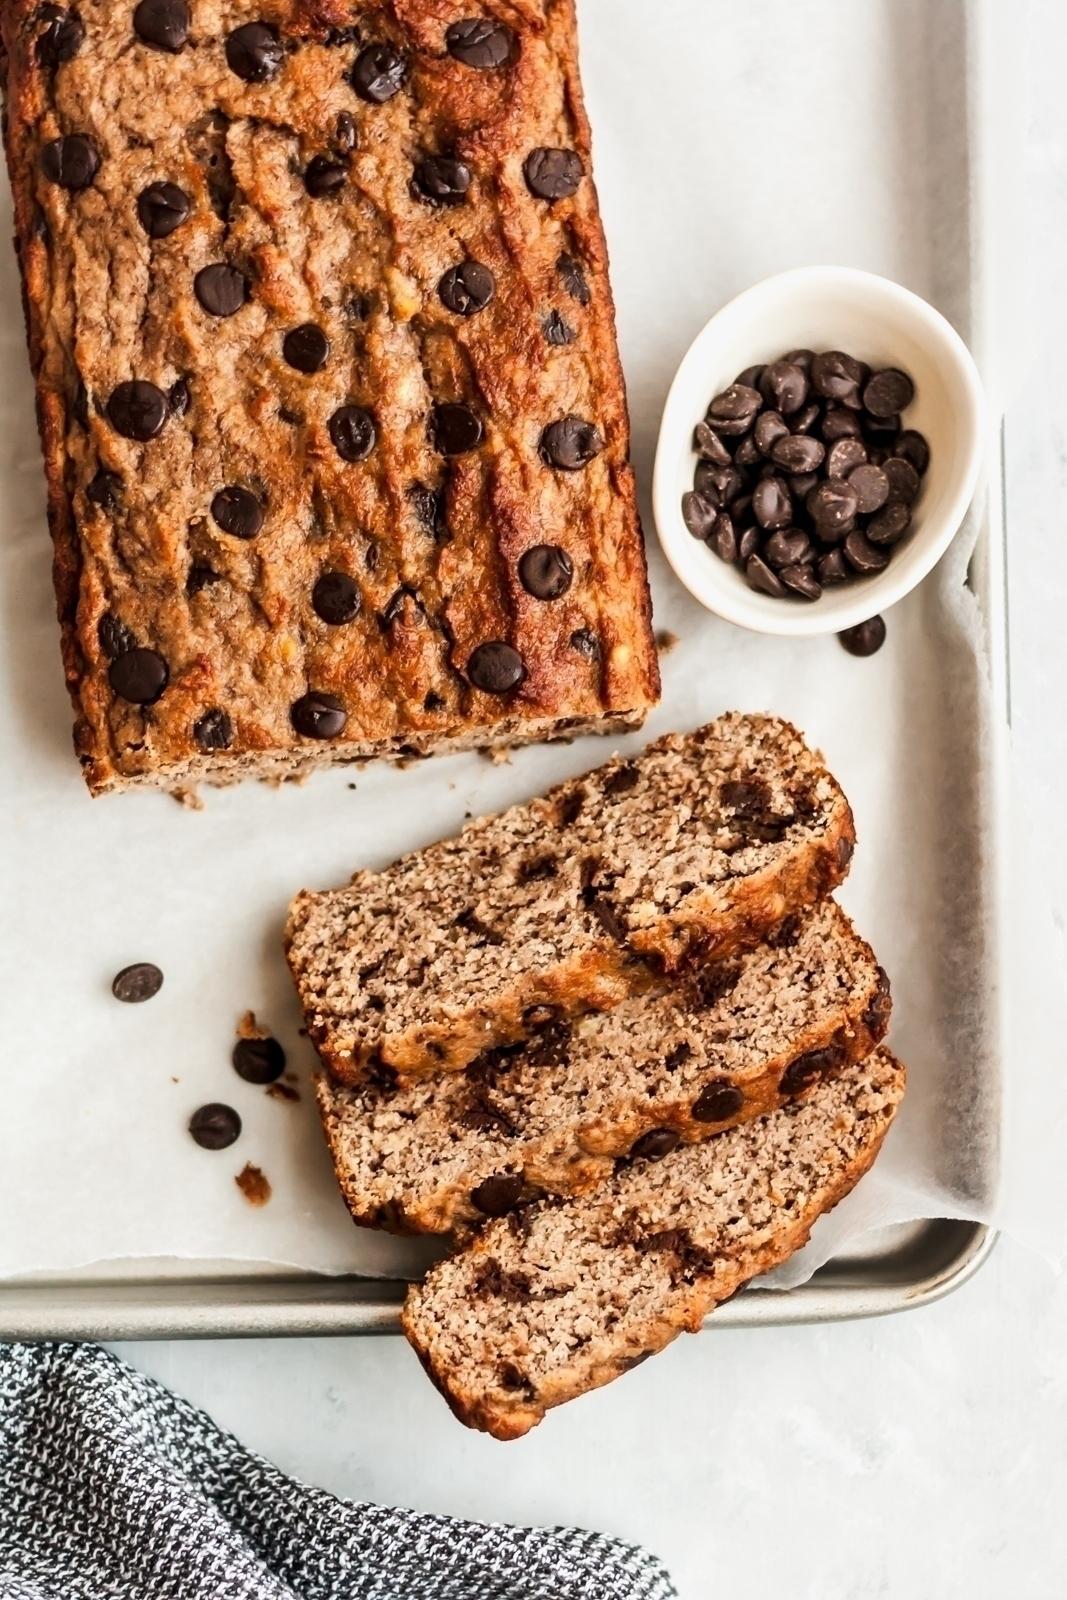 make-ahead breakfast recipes: coconut flour banana bread on a baking sheet